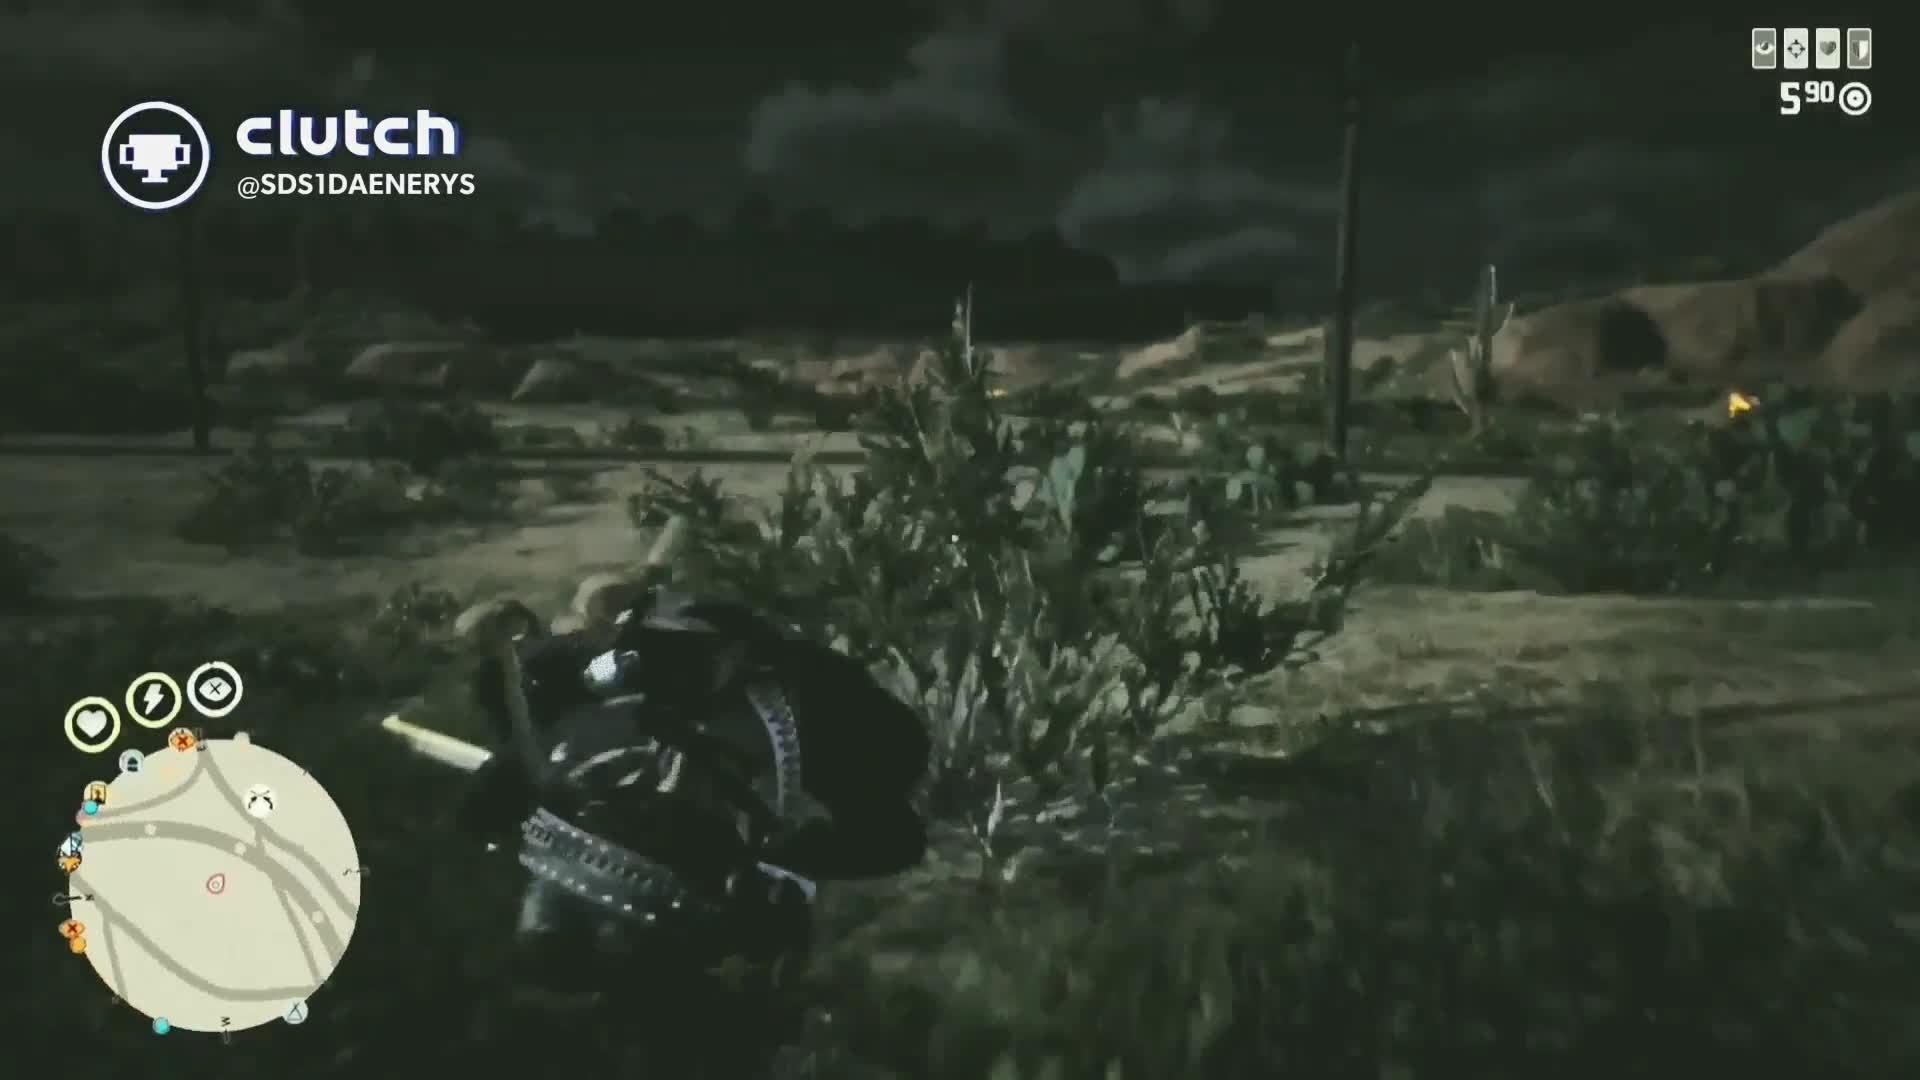 Red Dead Redemption: General - Juicesystem 🤢👎 video cover image 0